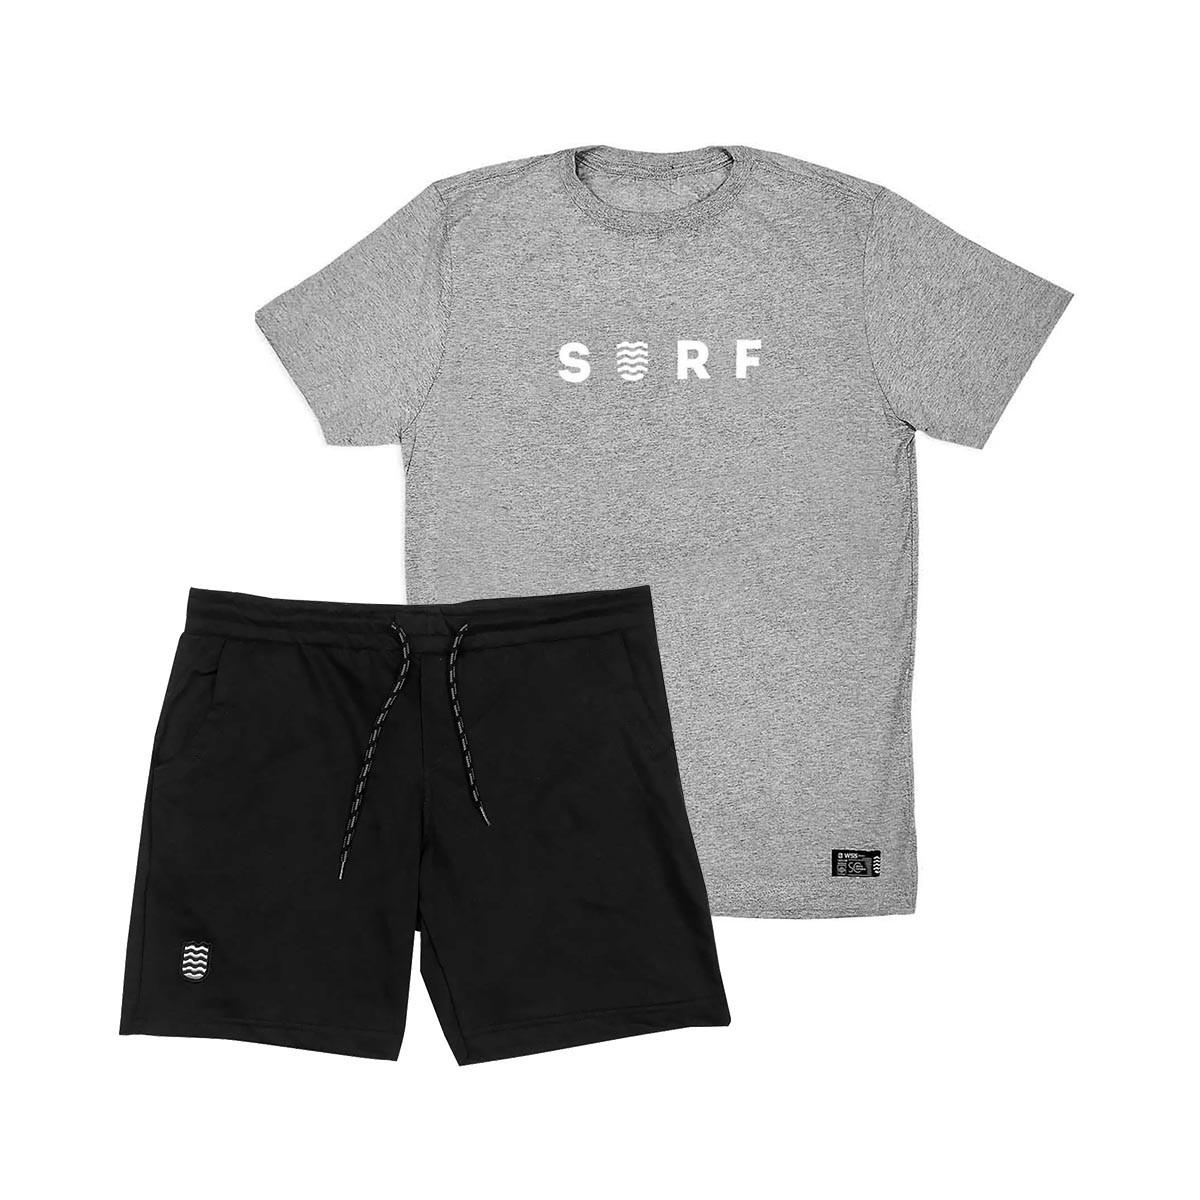 Kit Bermuda Moletom + Camiseta WSS Brasil SURF  Grey